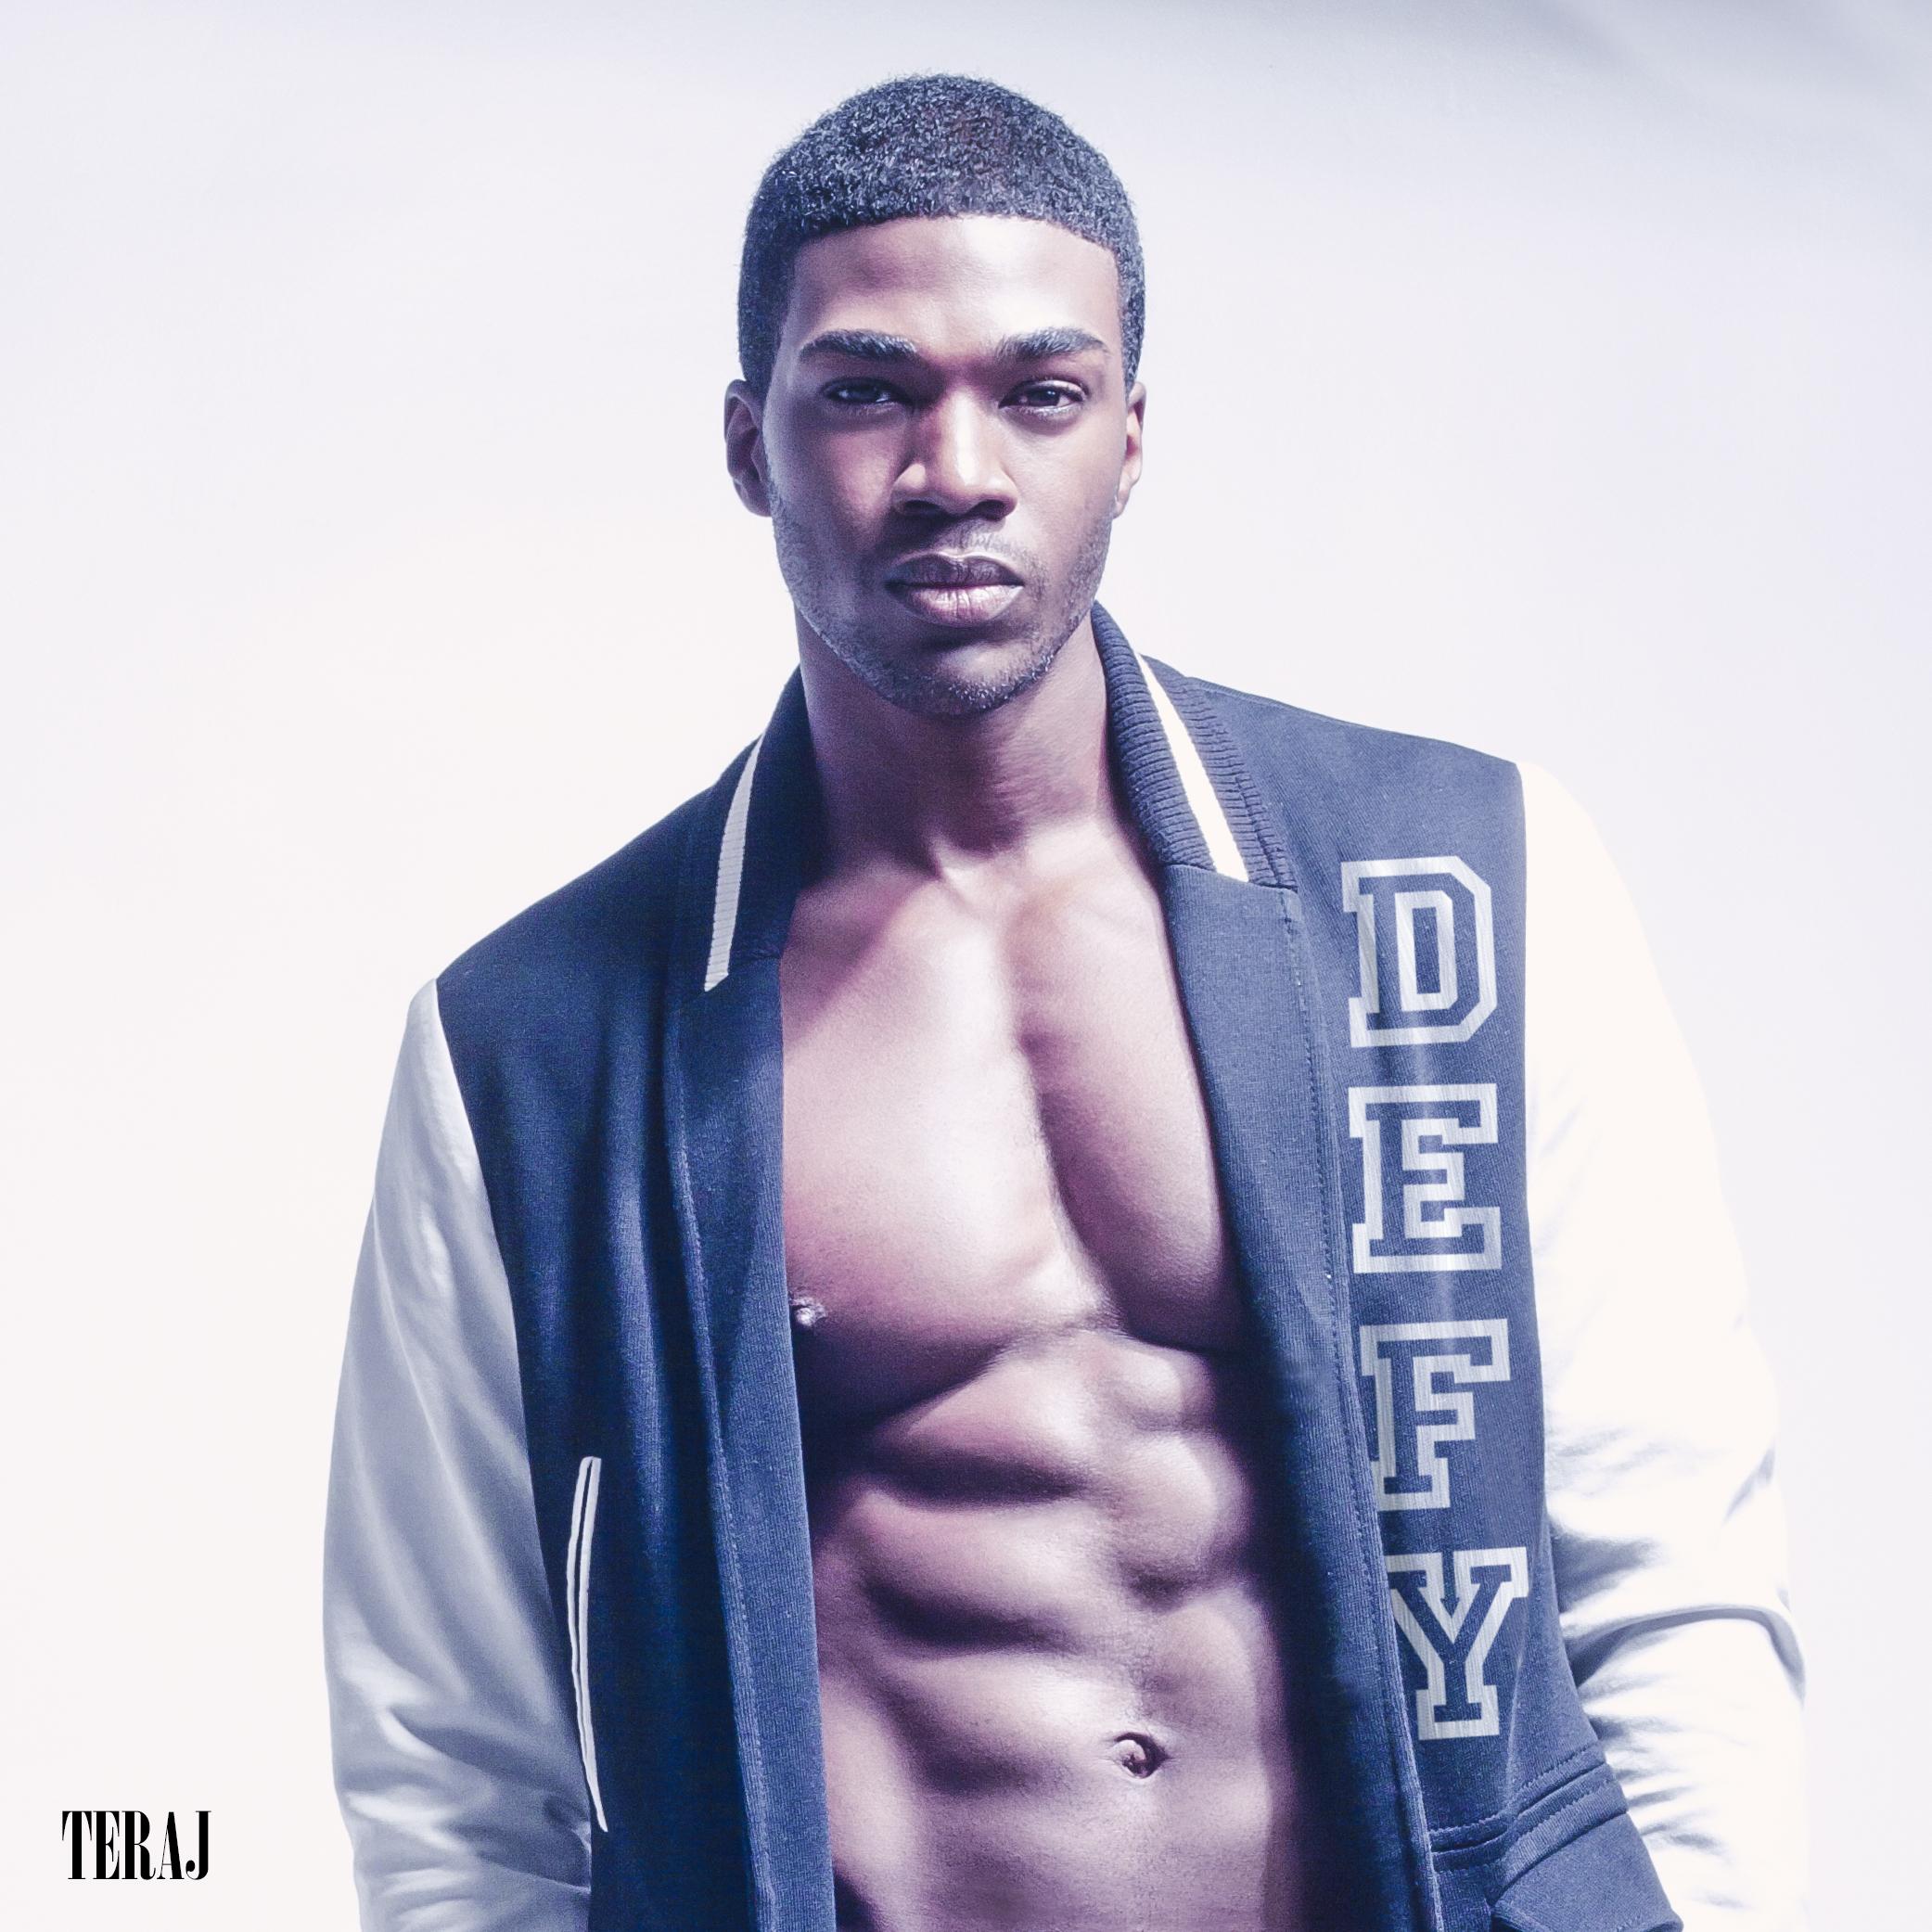 DEFY Album Cover Art